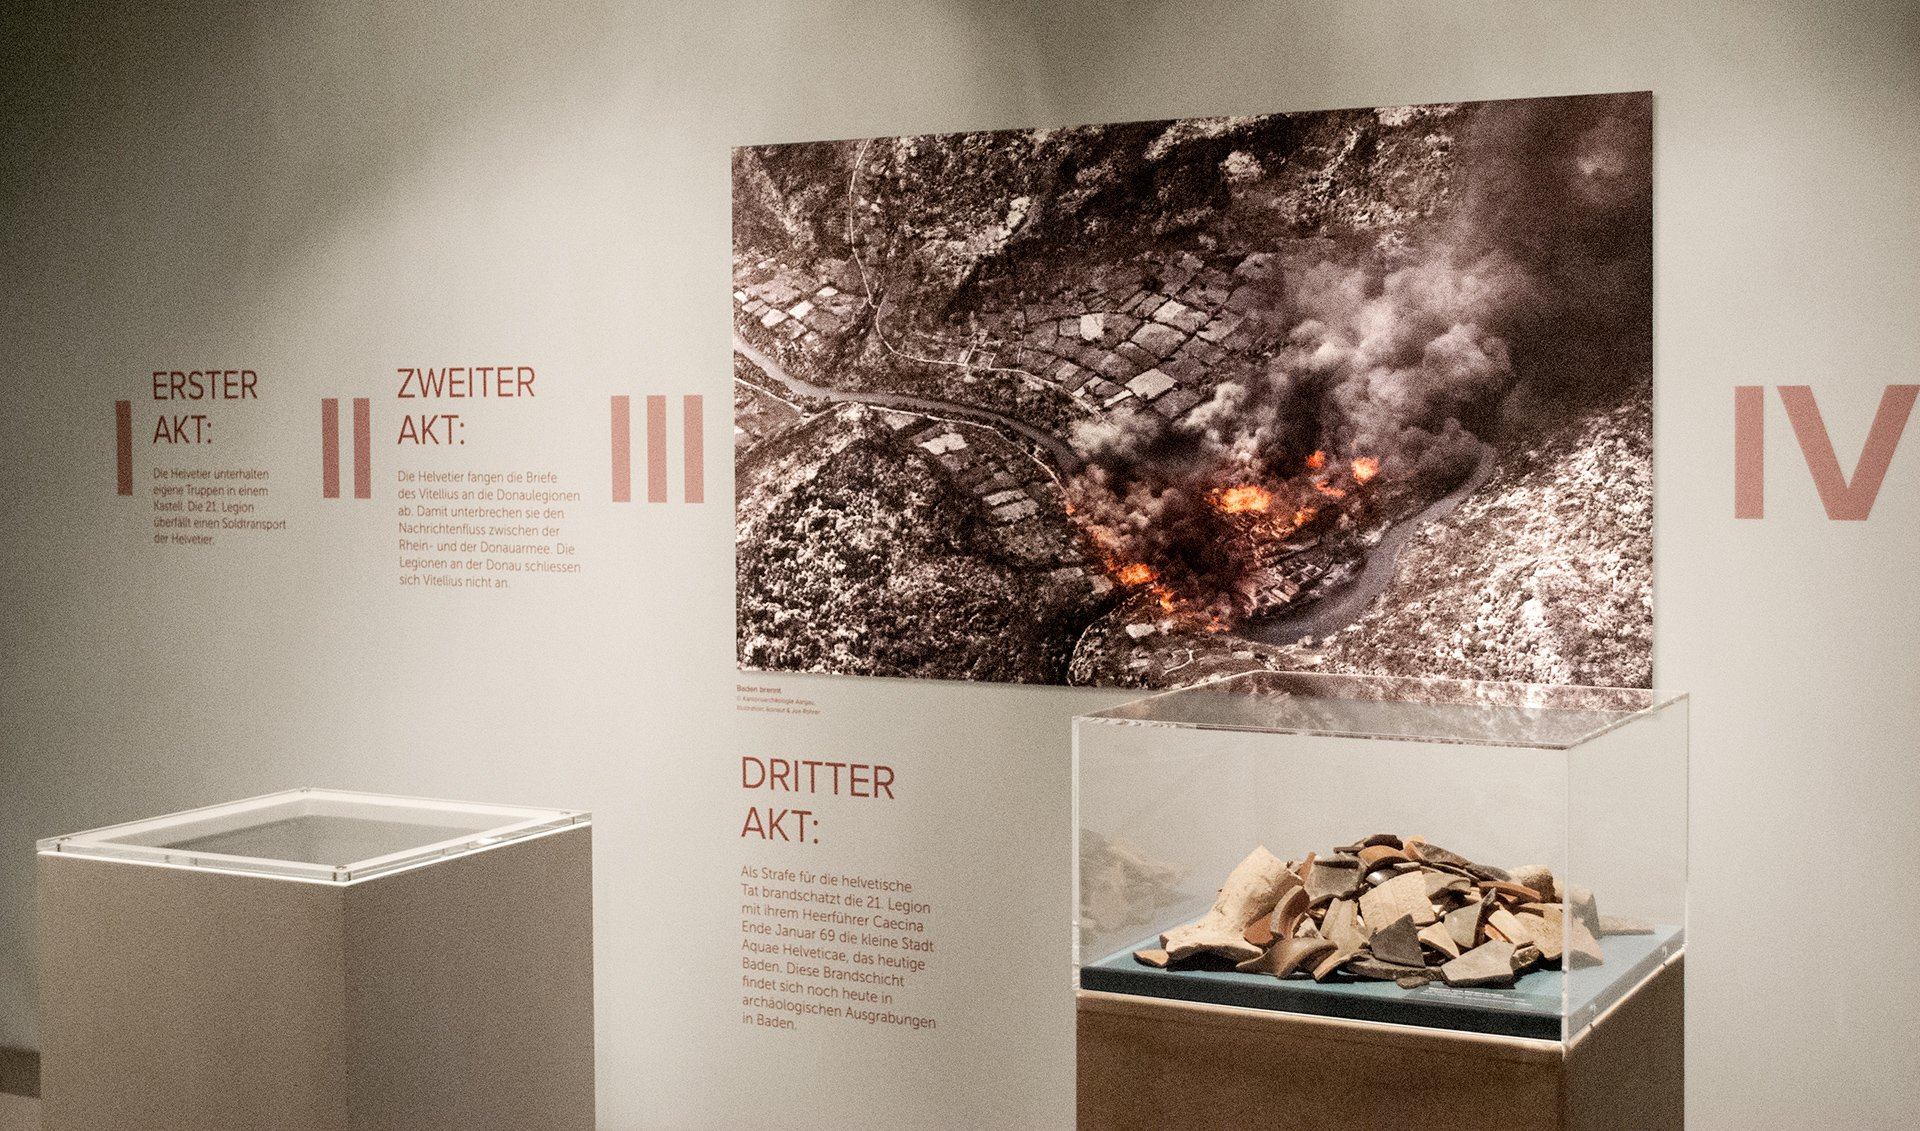 baden brennt, baden burns, ikonaut, ausstellung vindonissa museum